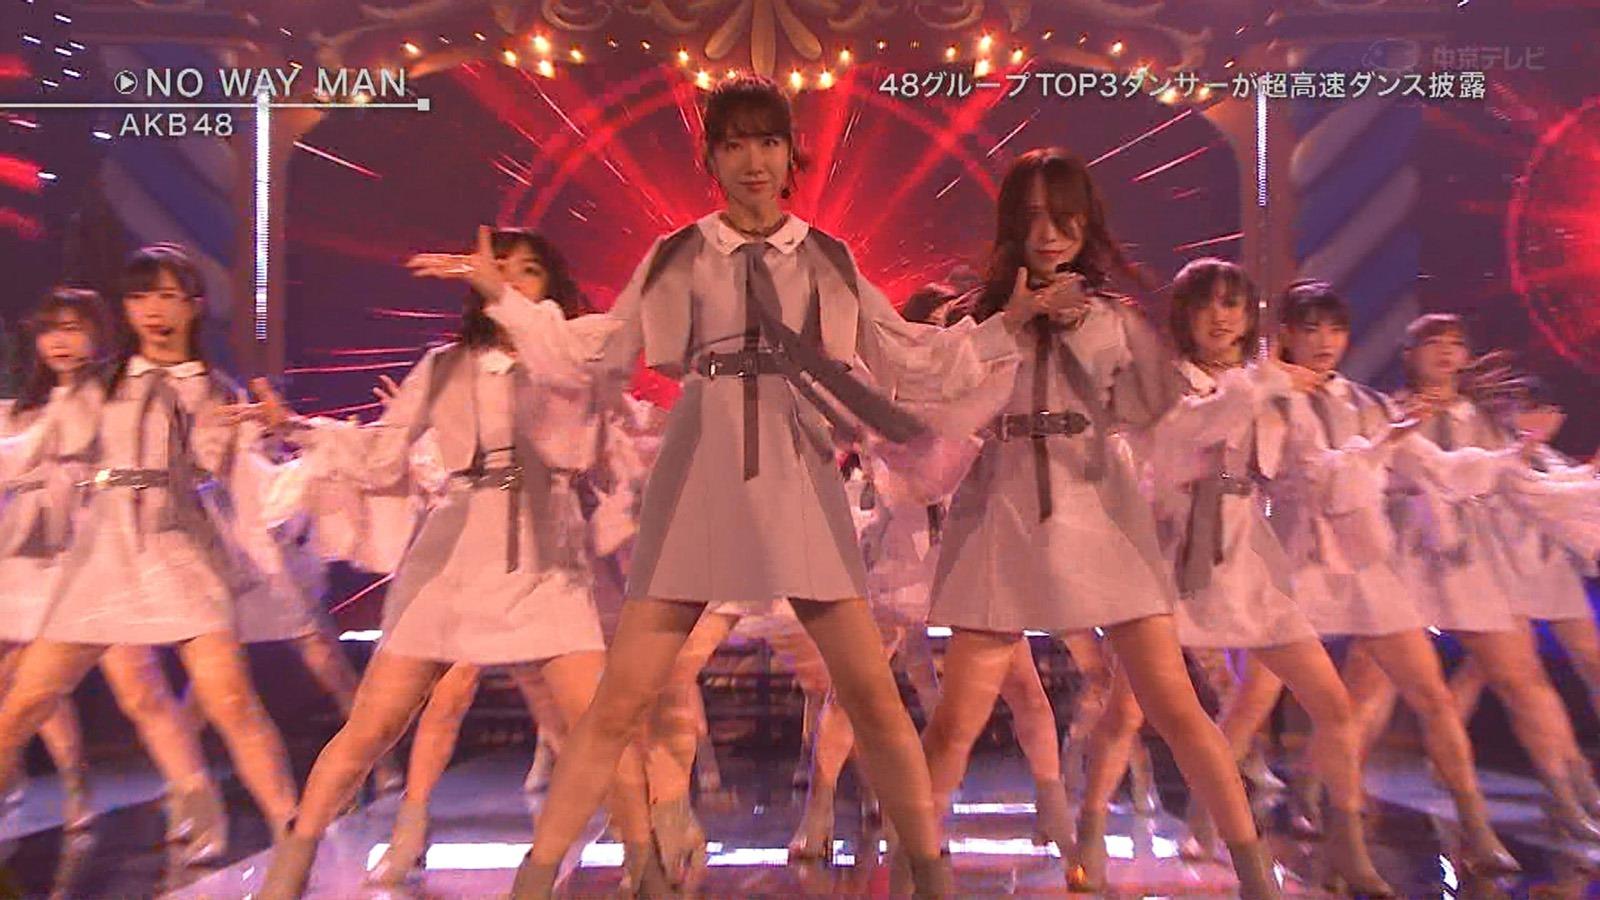 AKB48] Still Dreaming | 百合 Goggles